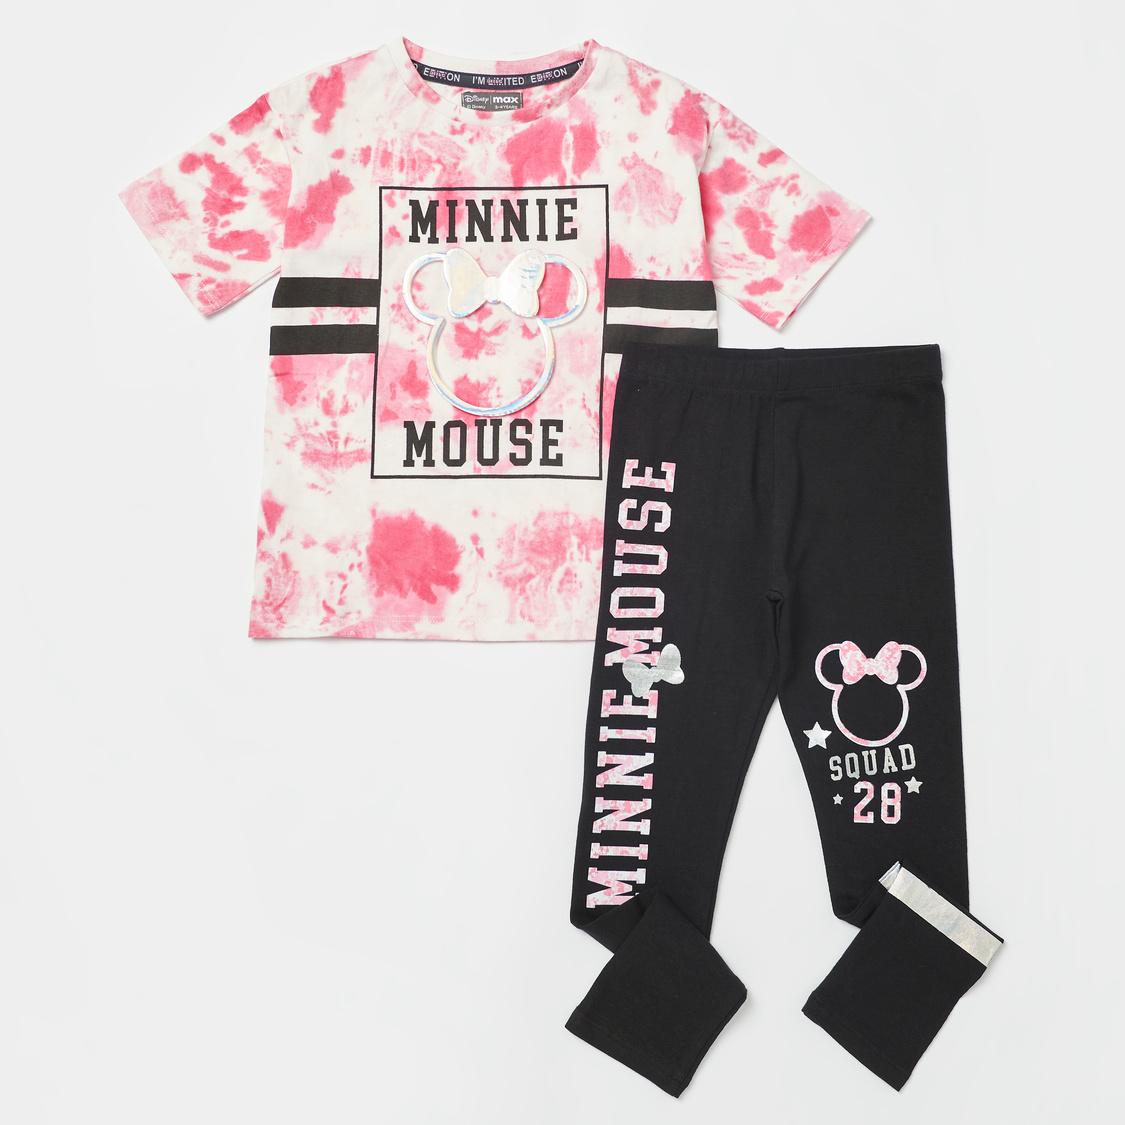 Minnie Mouse Applique Detail T-shirt with Graphic Print Leggings